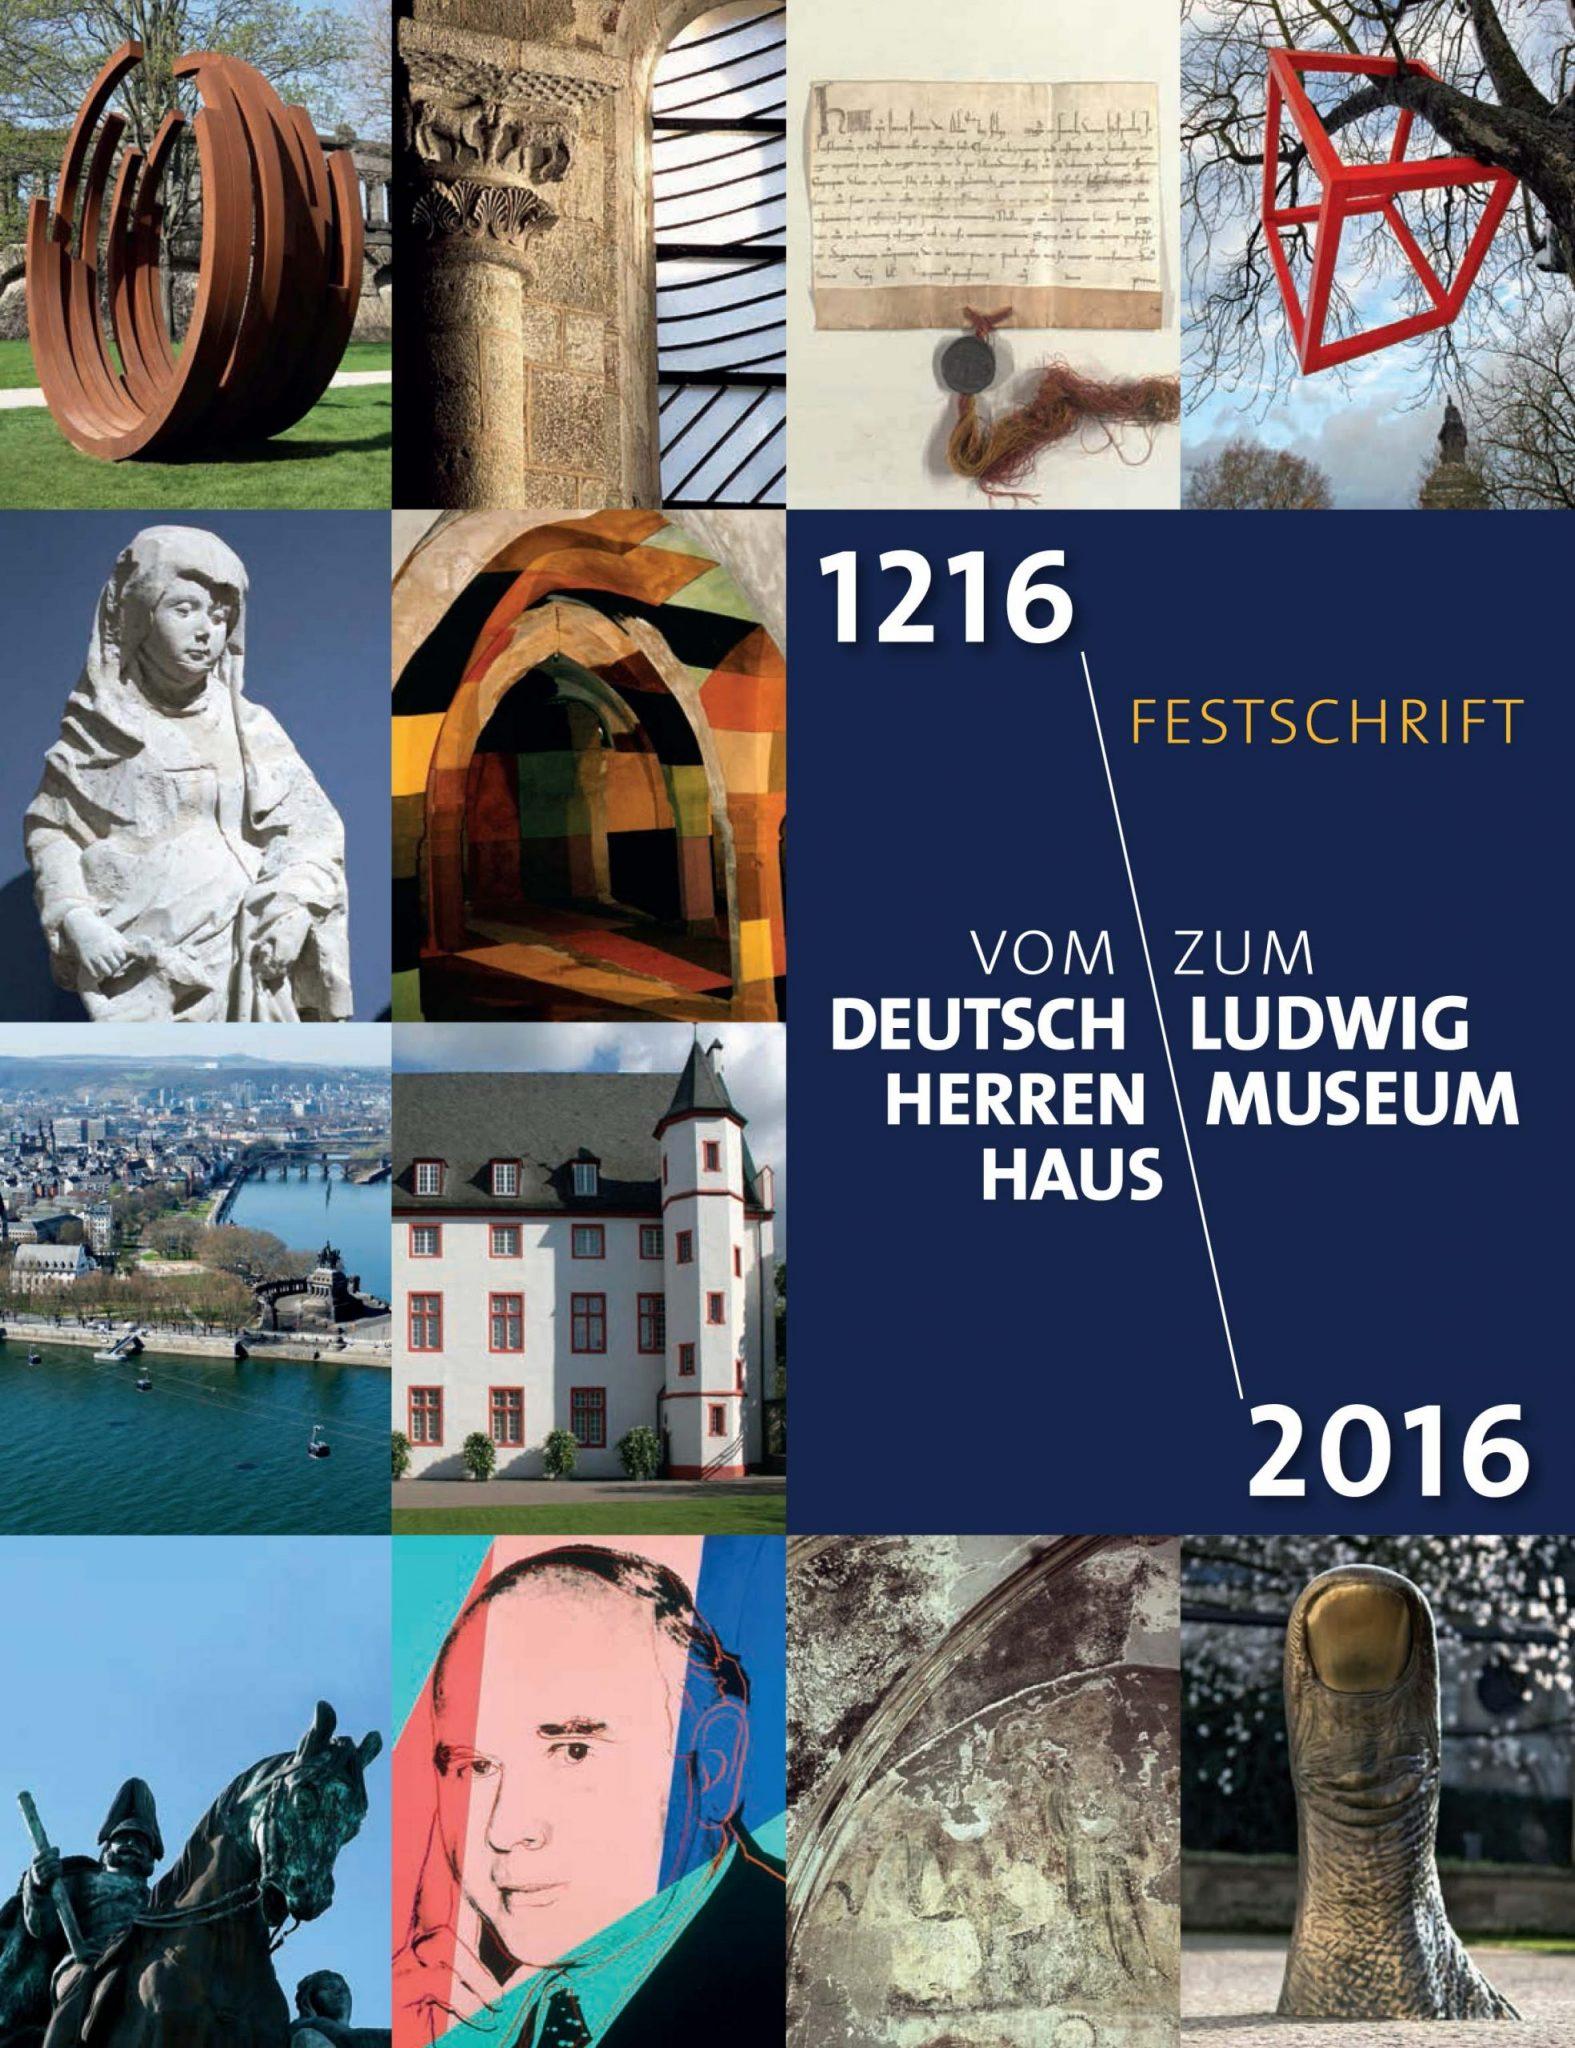 Shop Katalog Cover Buch Festschrift Deutschherrenhaus